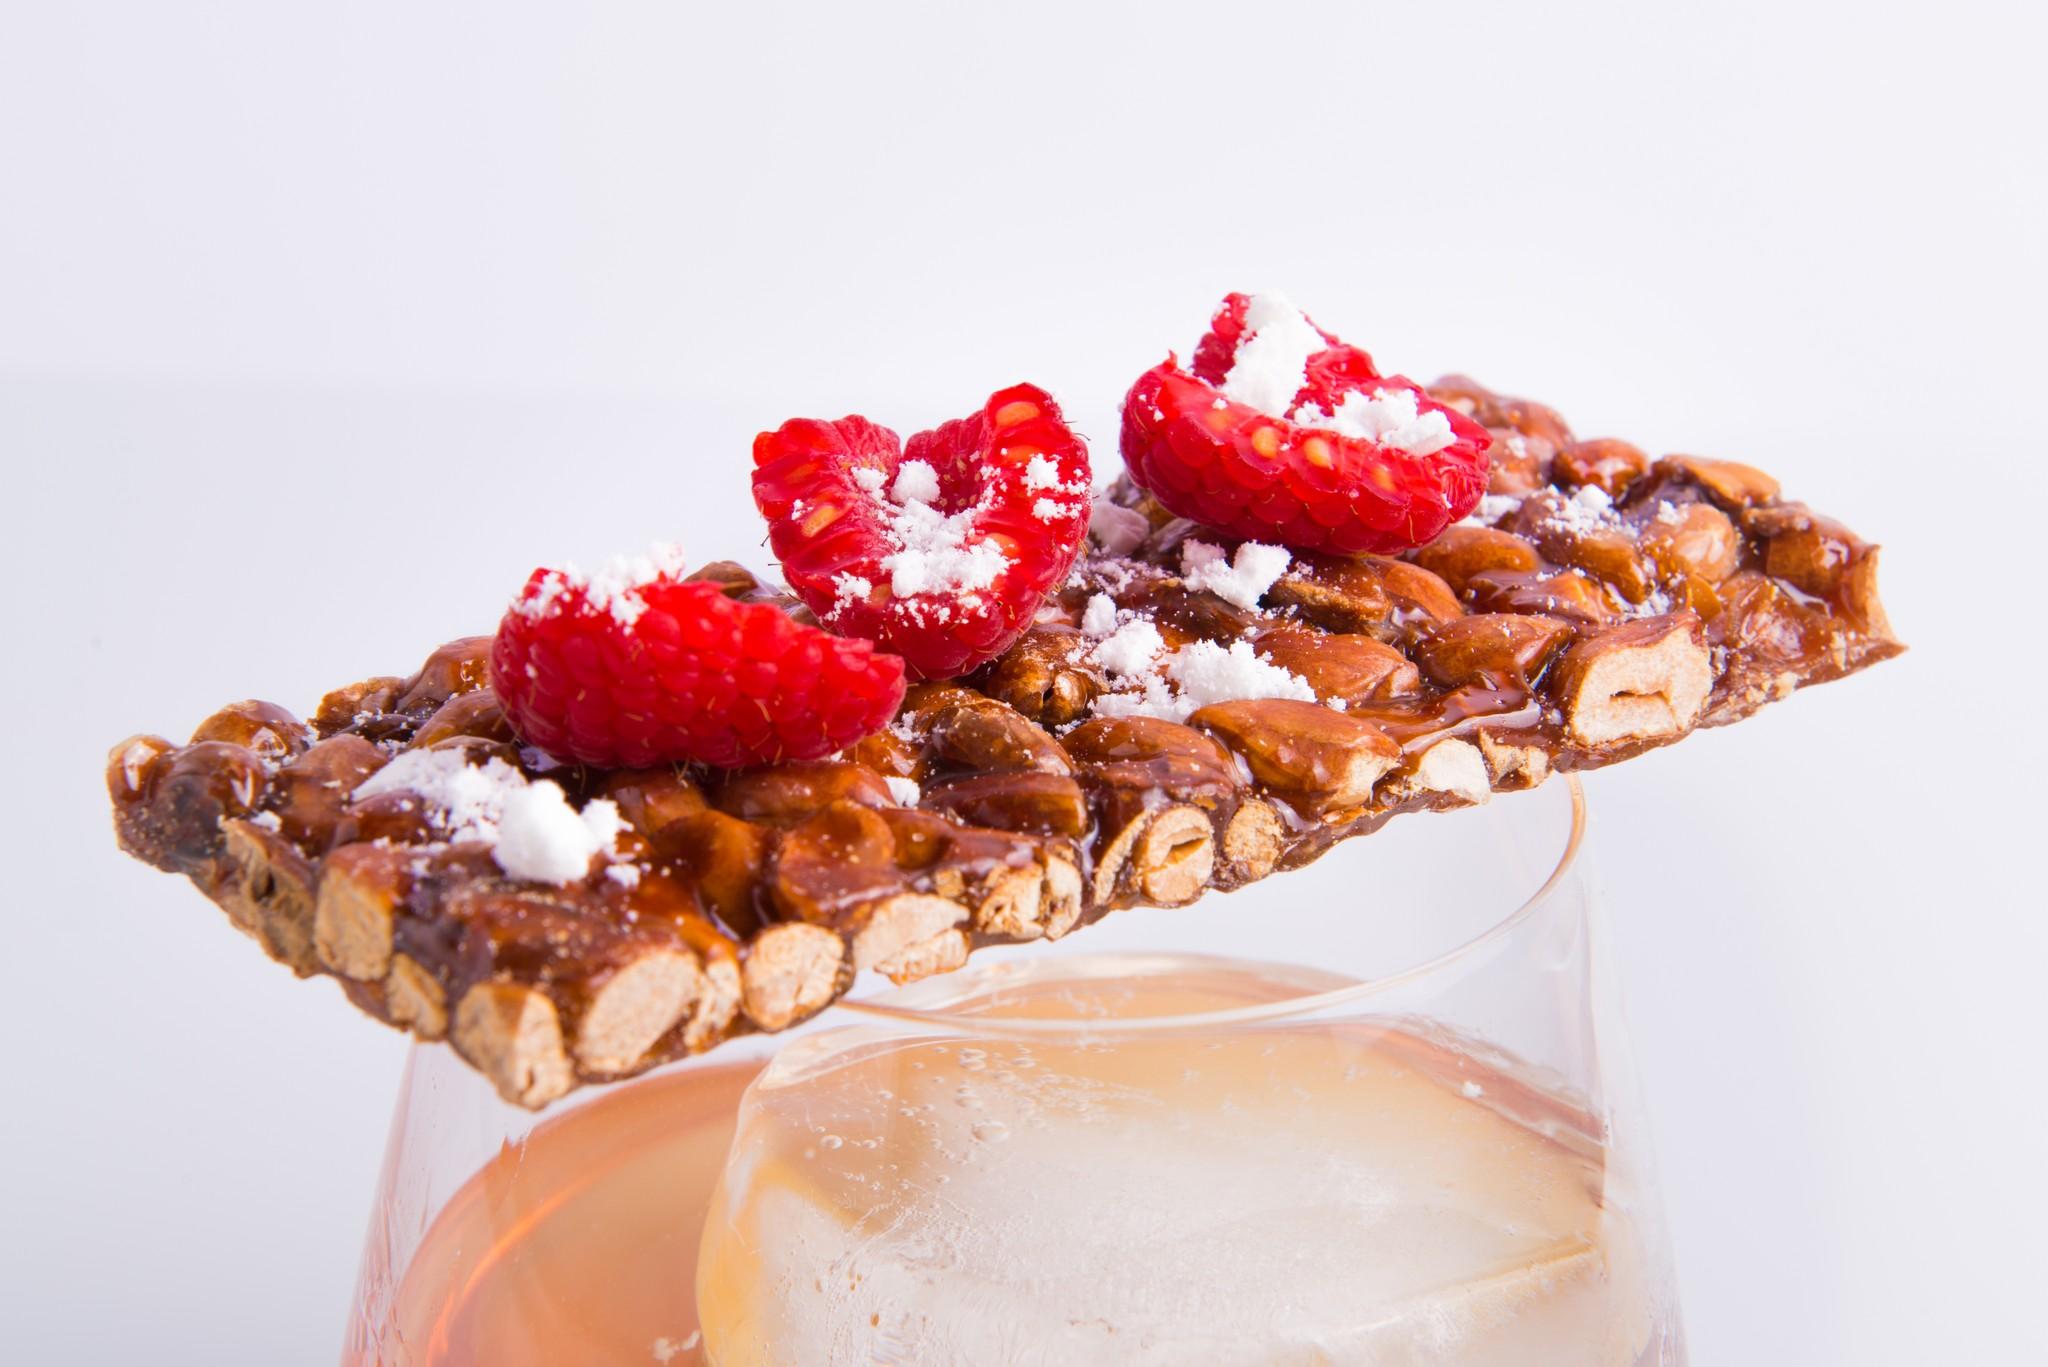 Flavia_Fiengo_Food_E_Beverage_00039